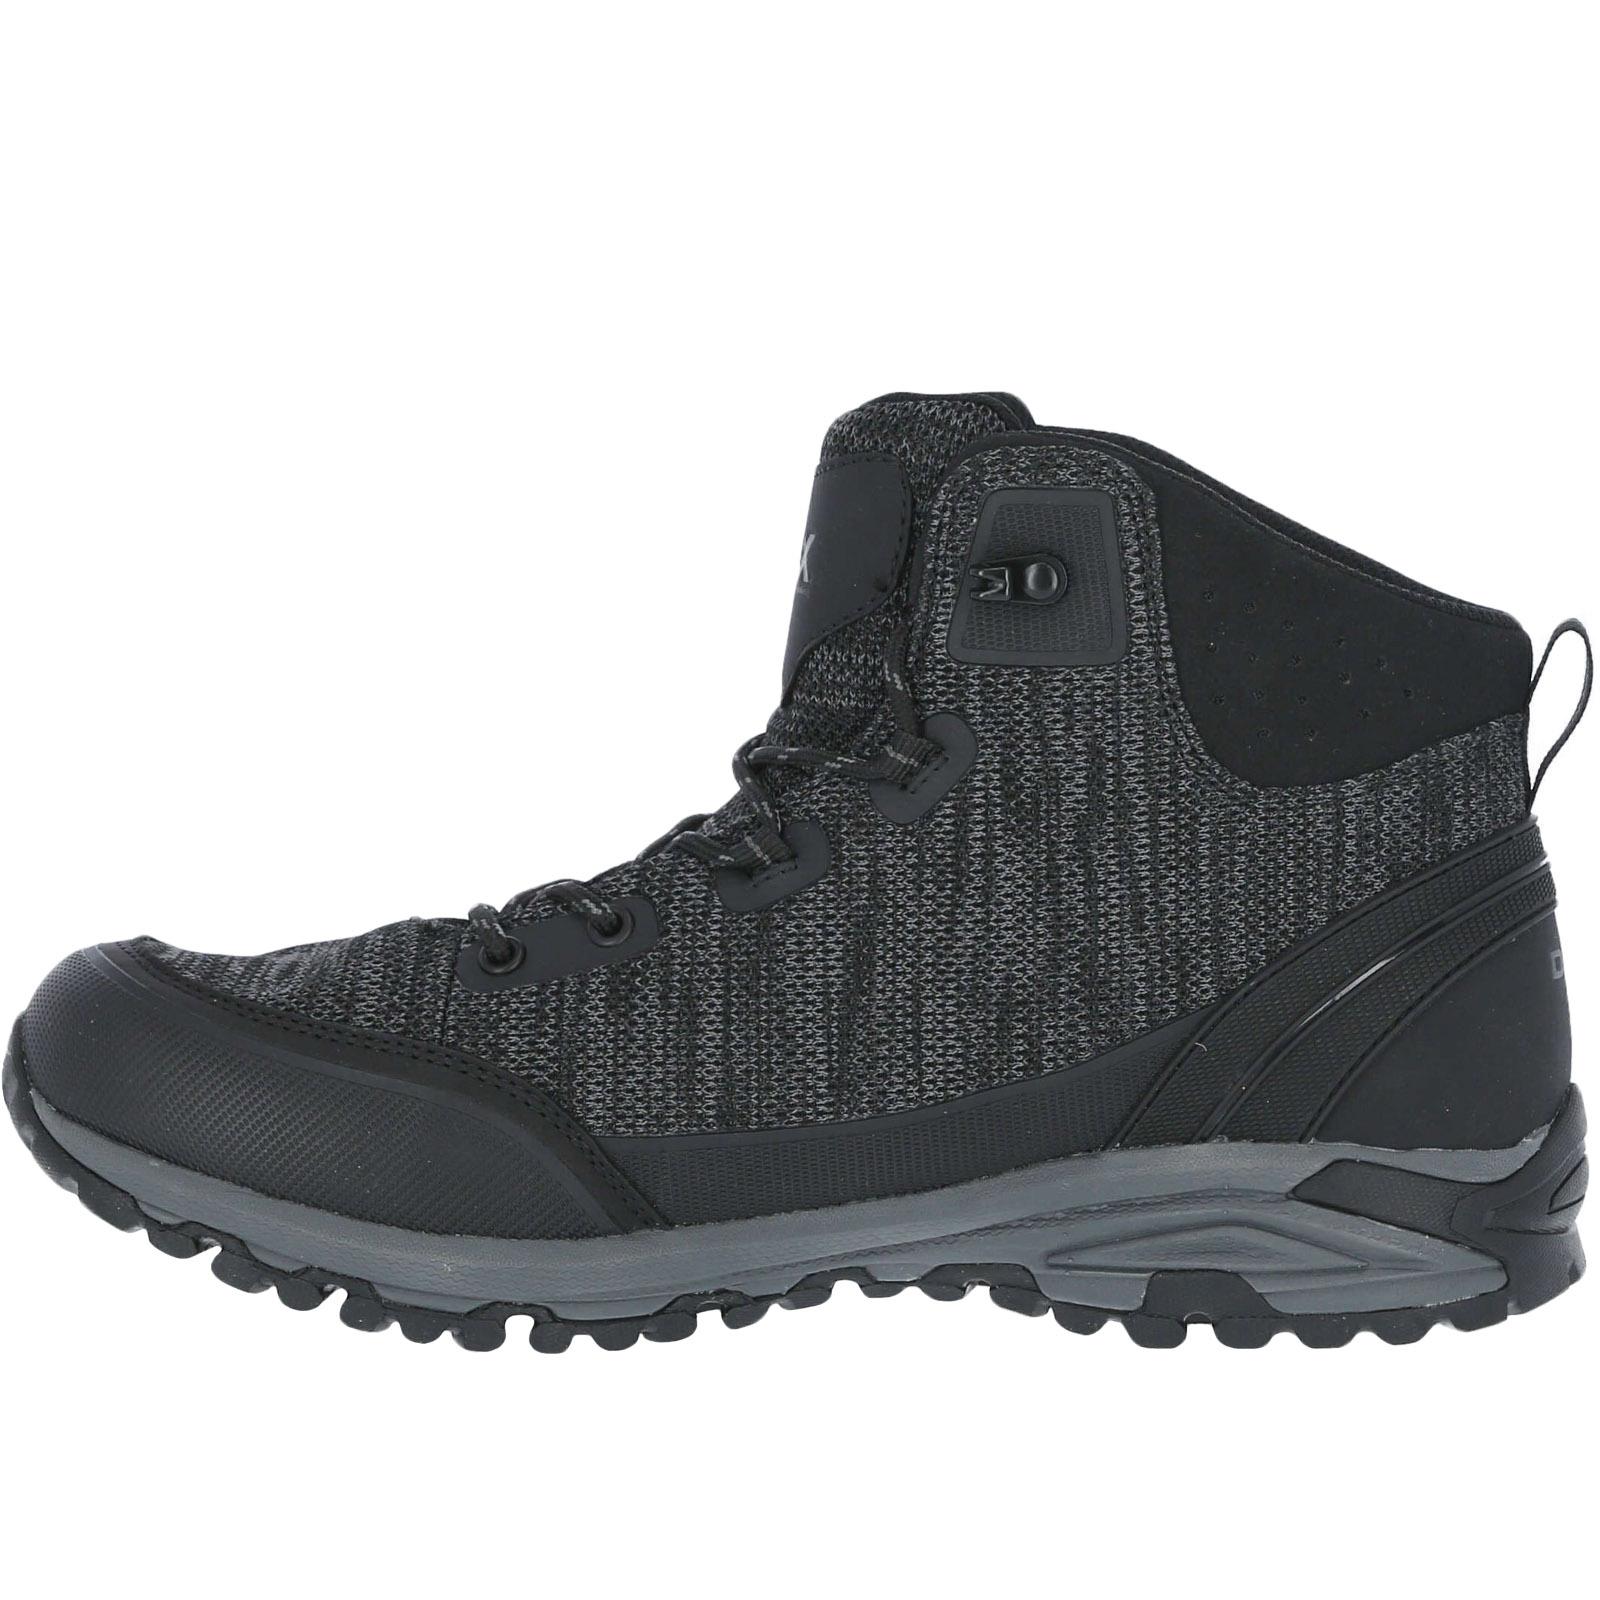 Trespass Boys /& Girls Cumberbatch Waterproof Breathable Walking Boots